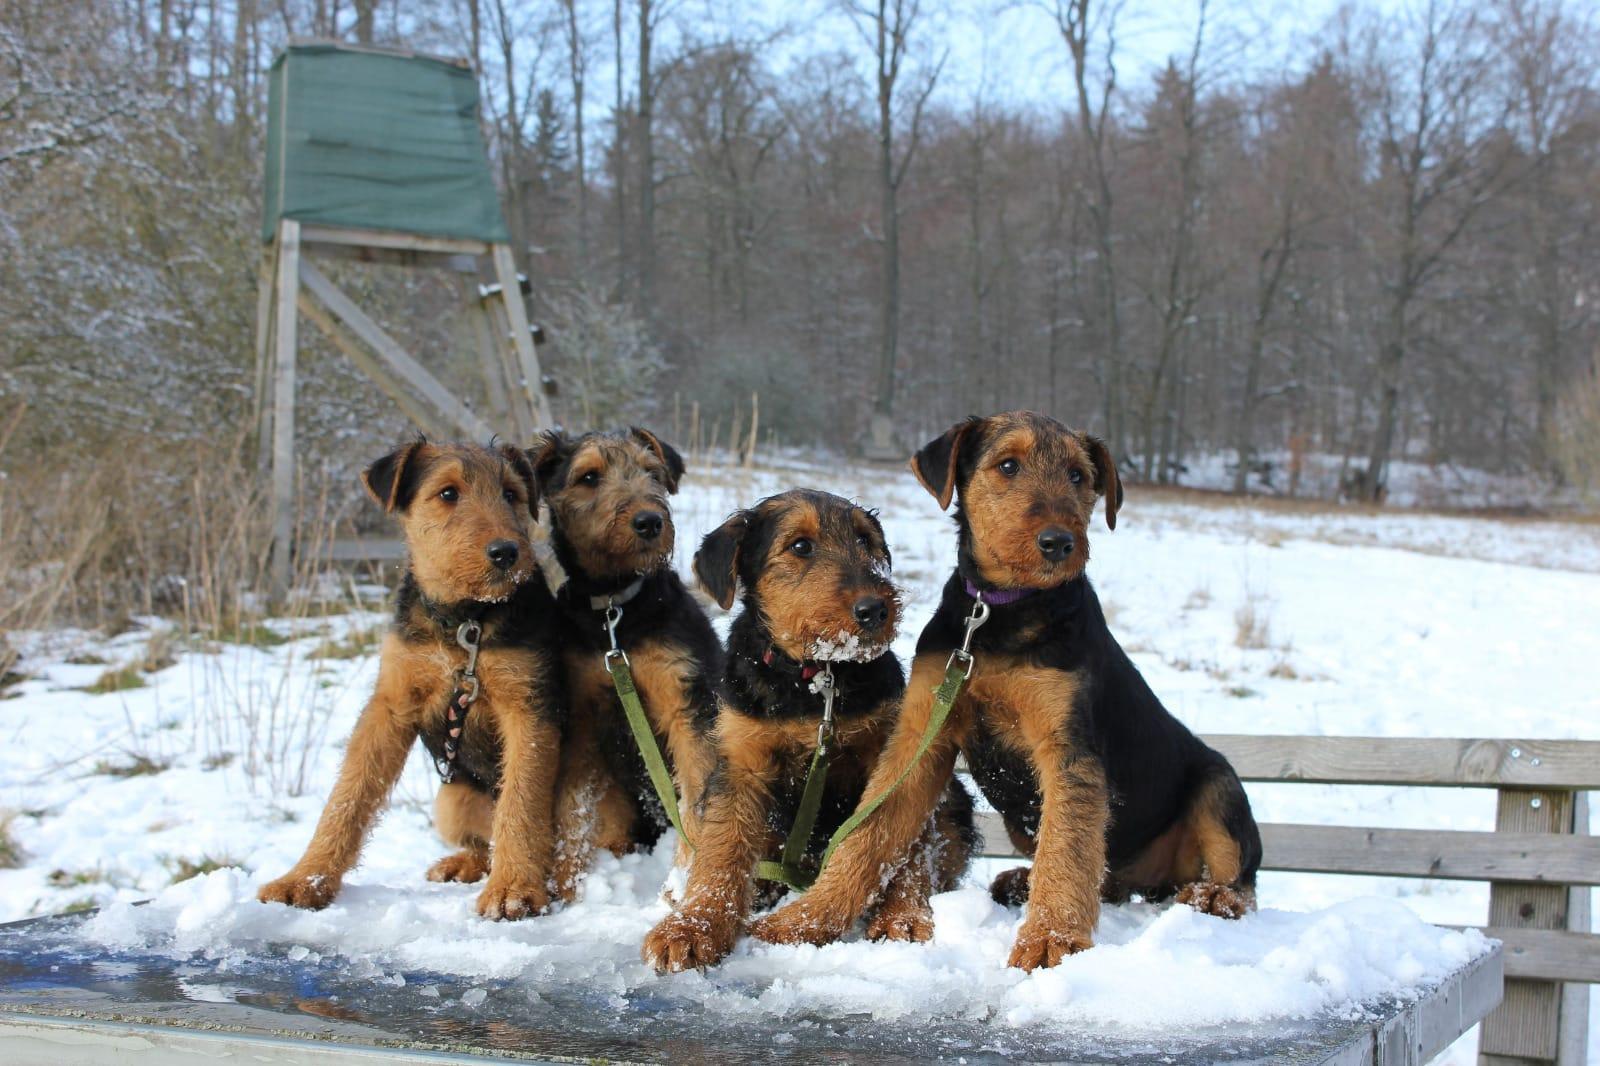 Airedale Terrier Welpen - Rassehunde - Hunde / Welpen - Haustier ...